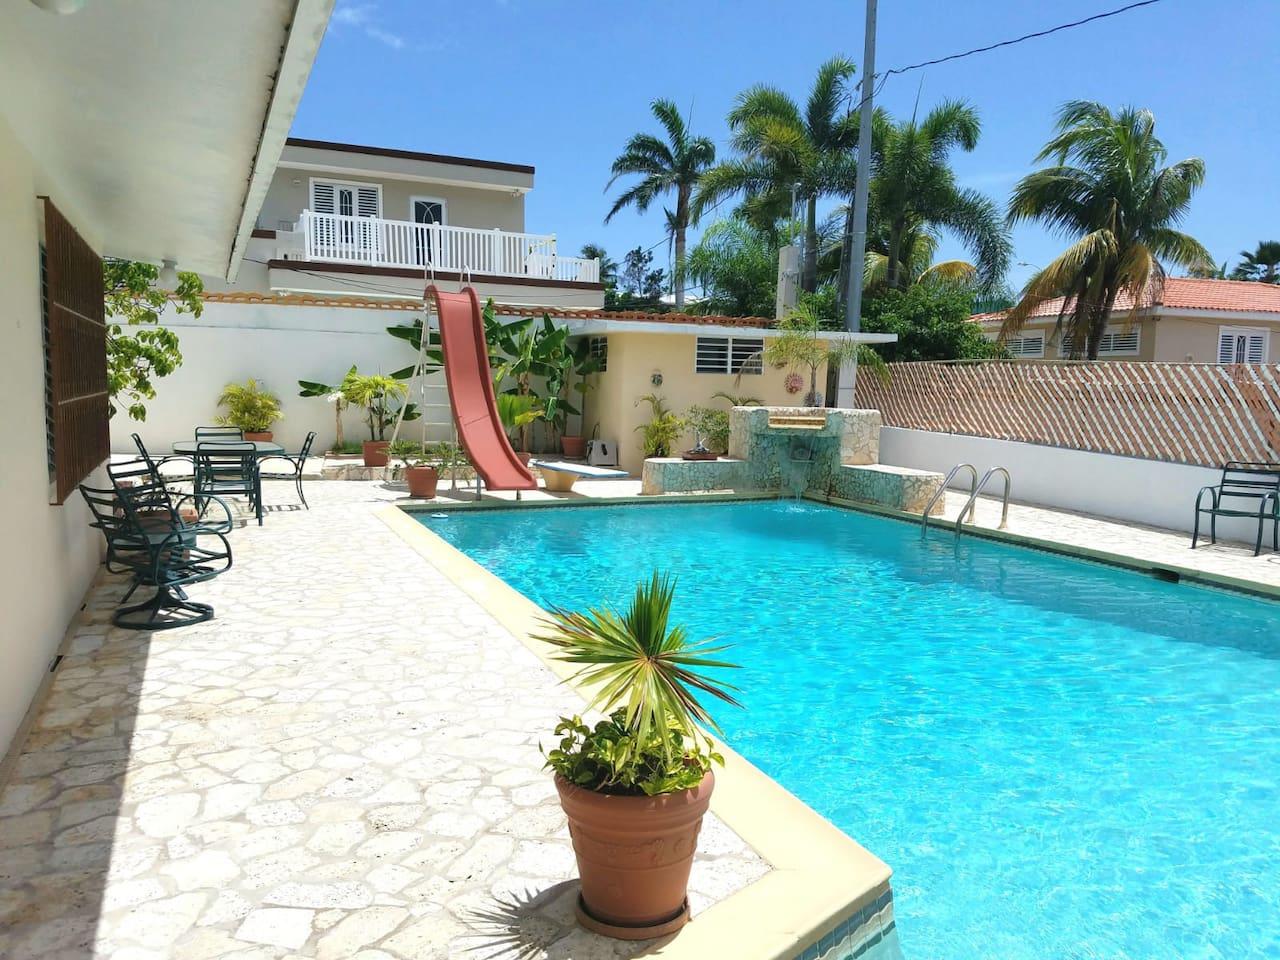 Poolside Chill Spot